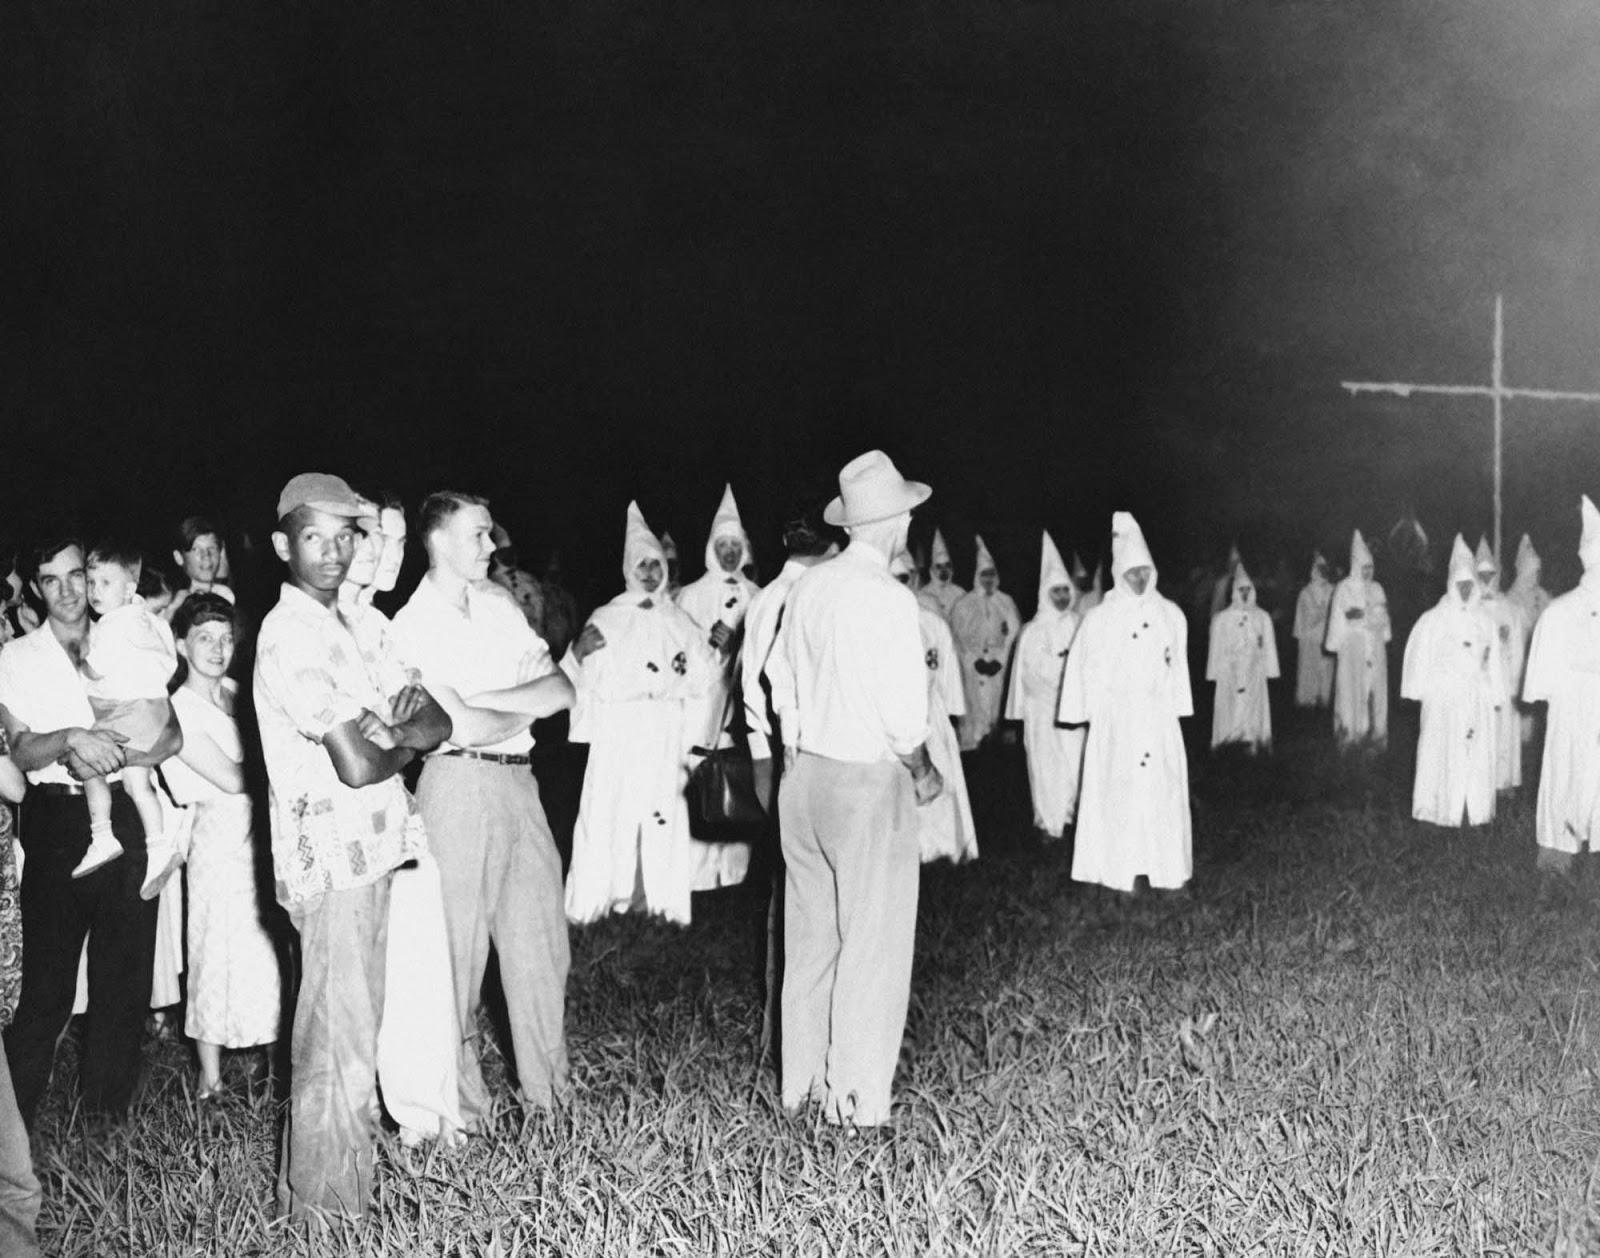 Un hombre afroamericano solitario asiste a un mitin de Klan en Jackson, Mississippi, 1950.